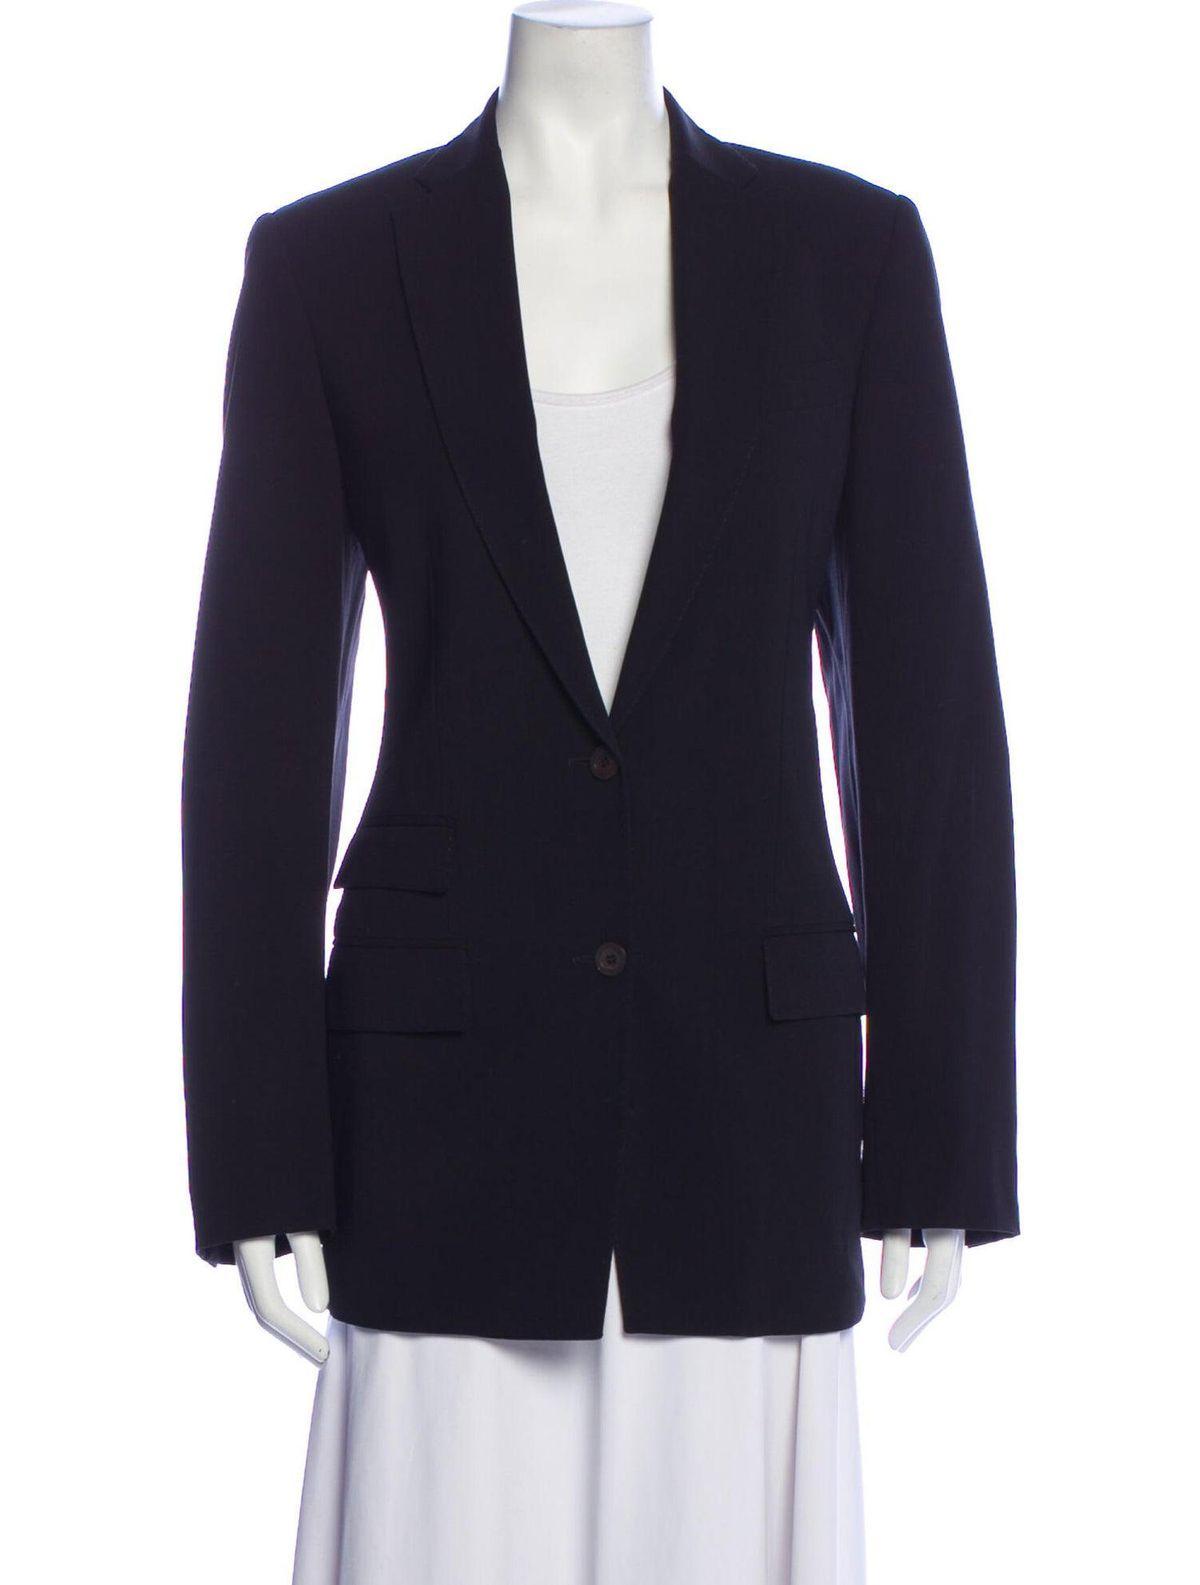 Vintage 1999 Coat